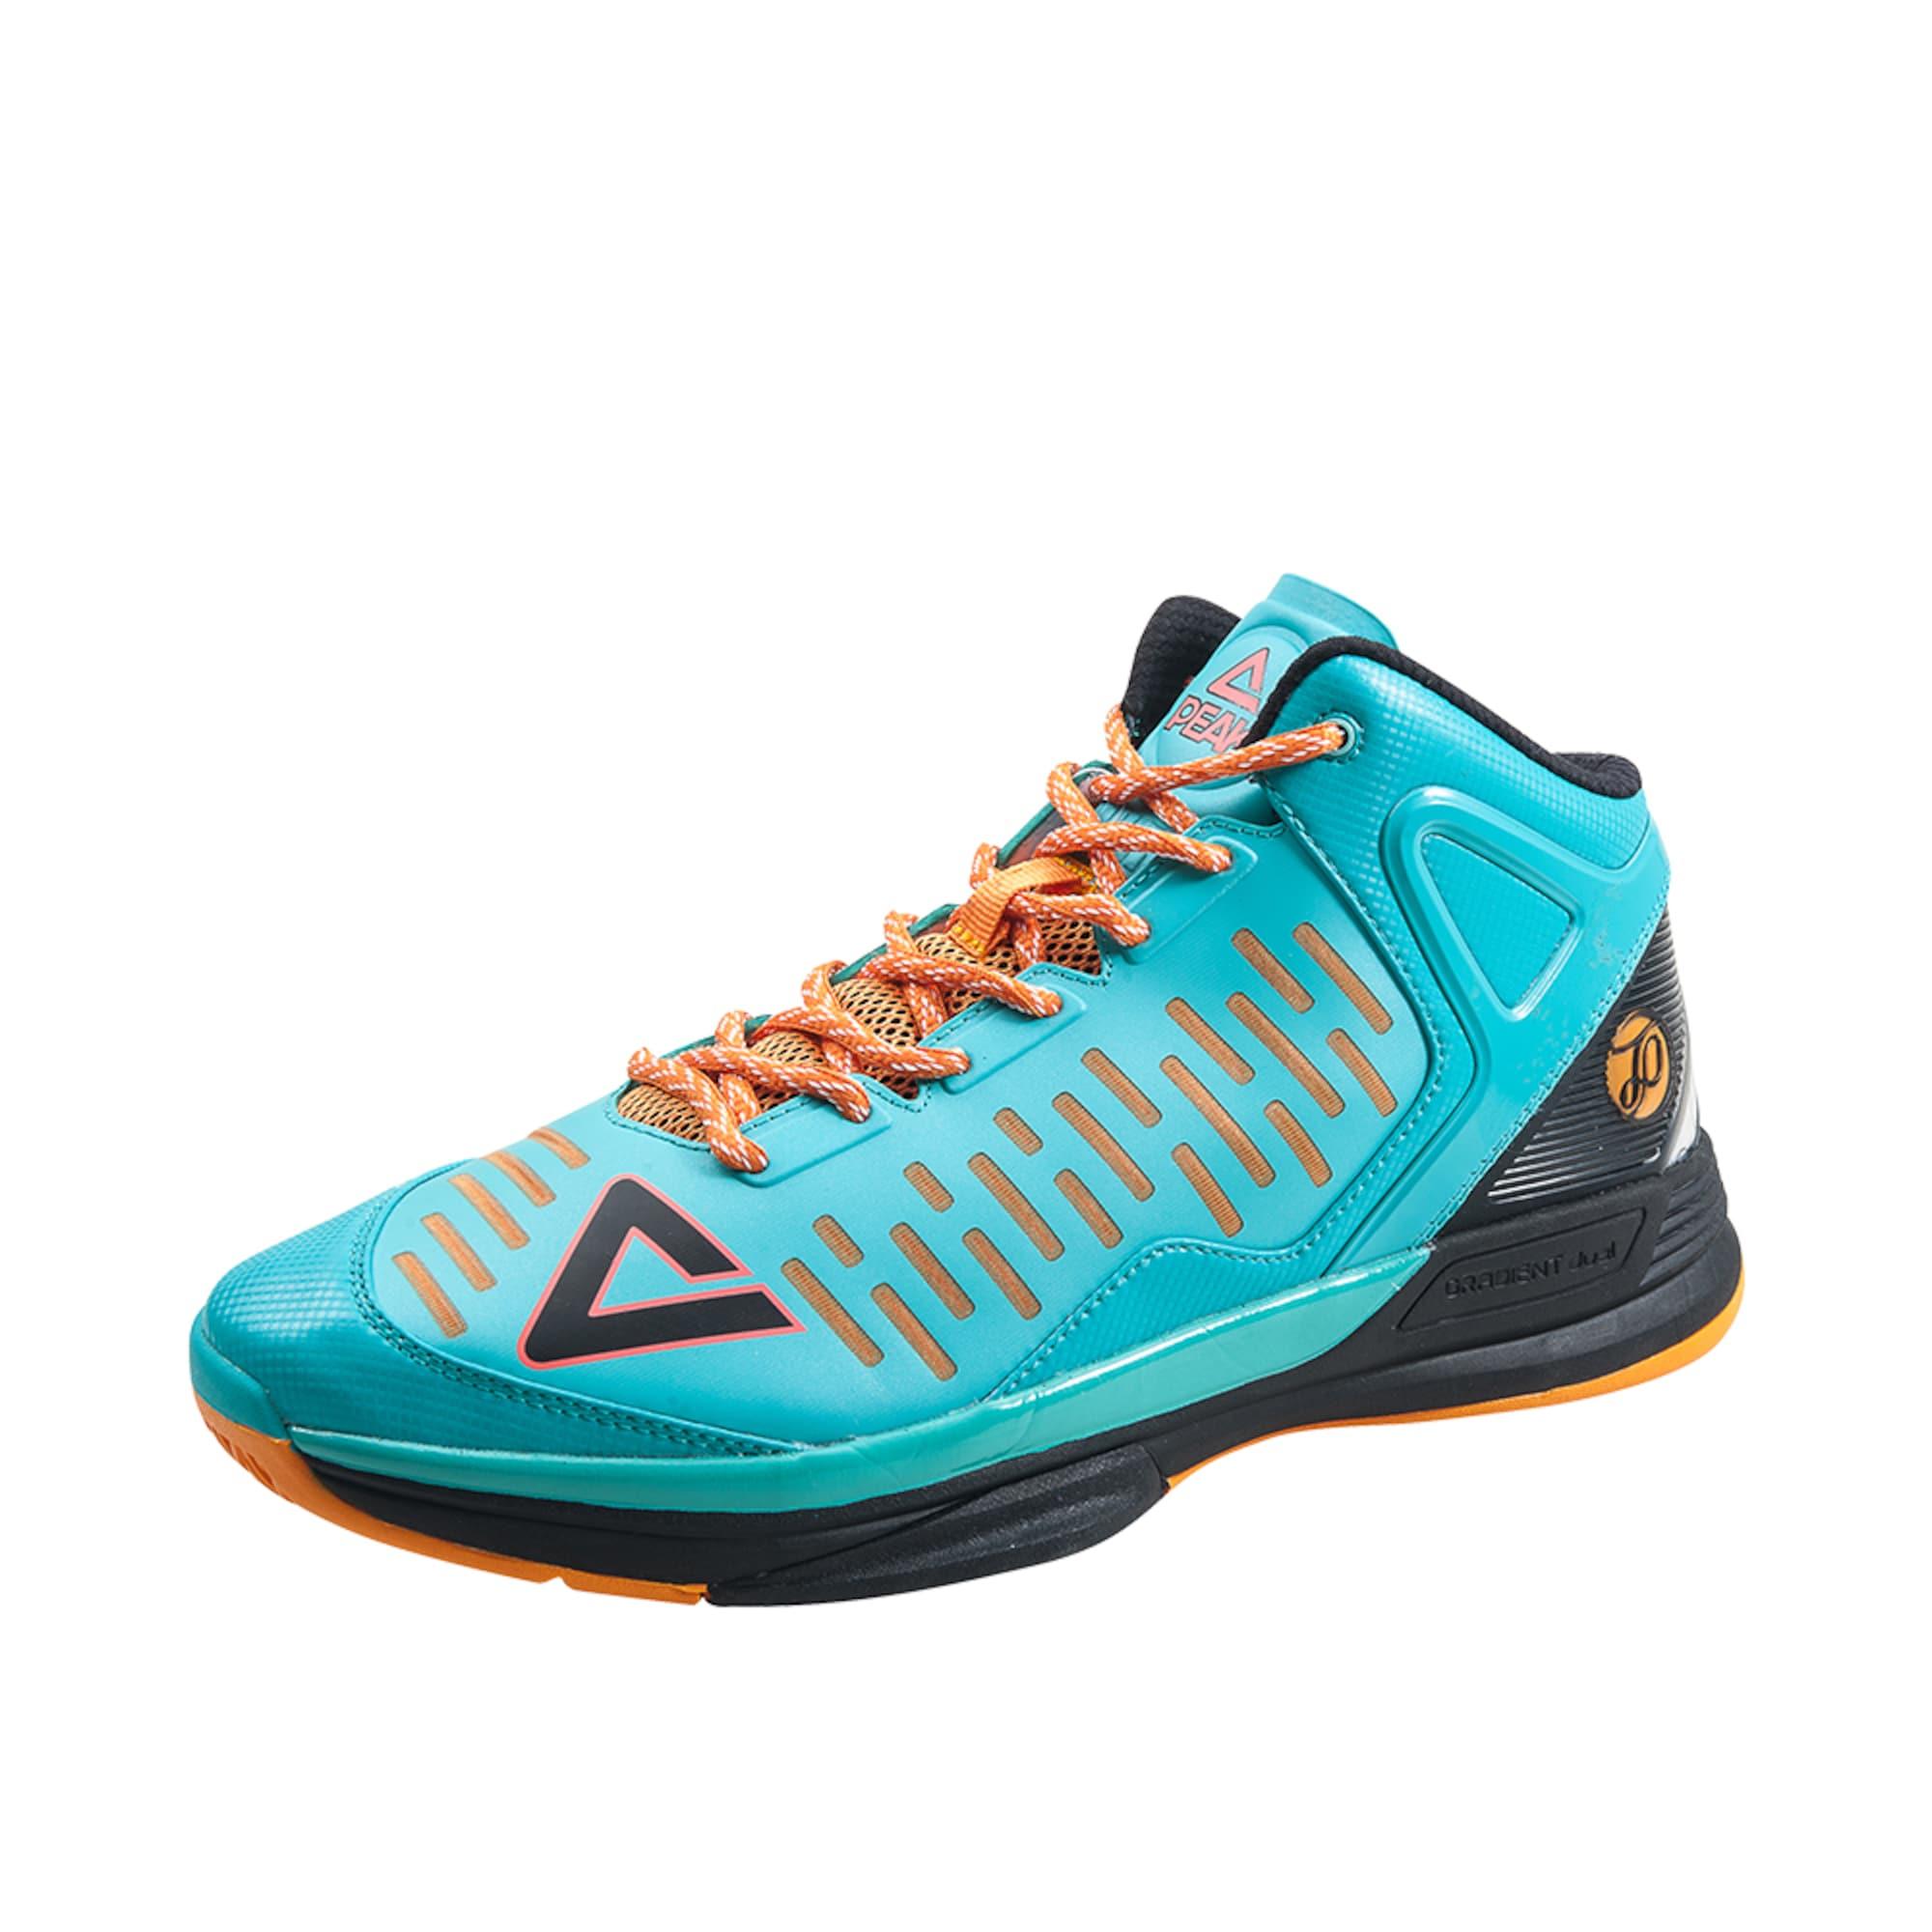 Basketballschuh TP9 II Tony Parker | Schuhe > Sportschuhe > Basketballschuhe | Peak